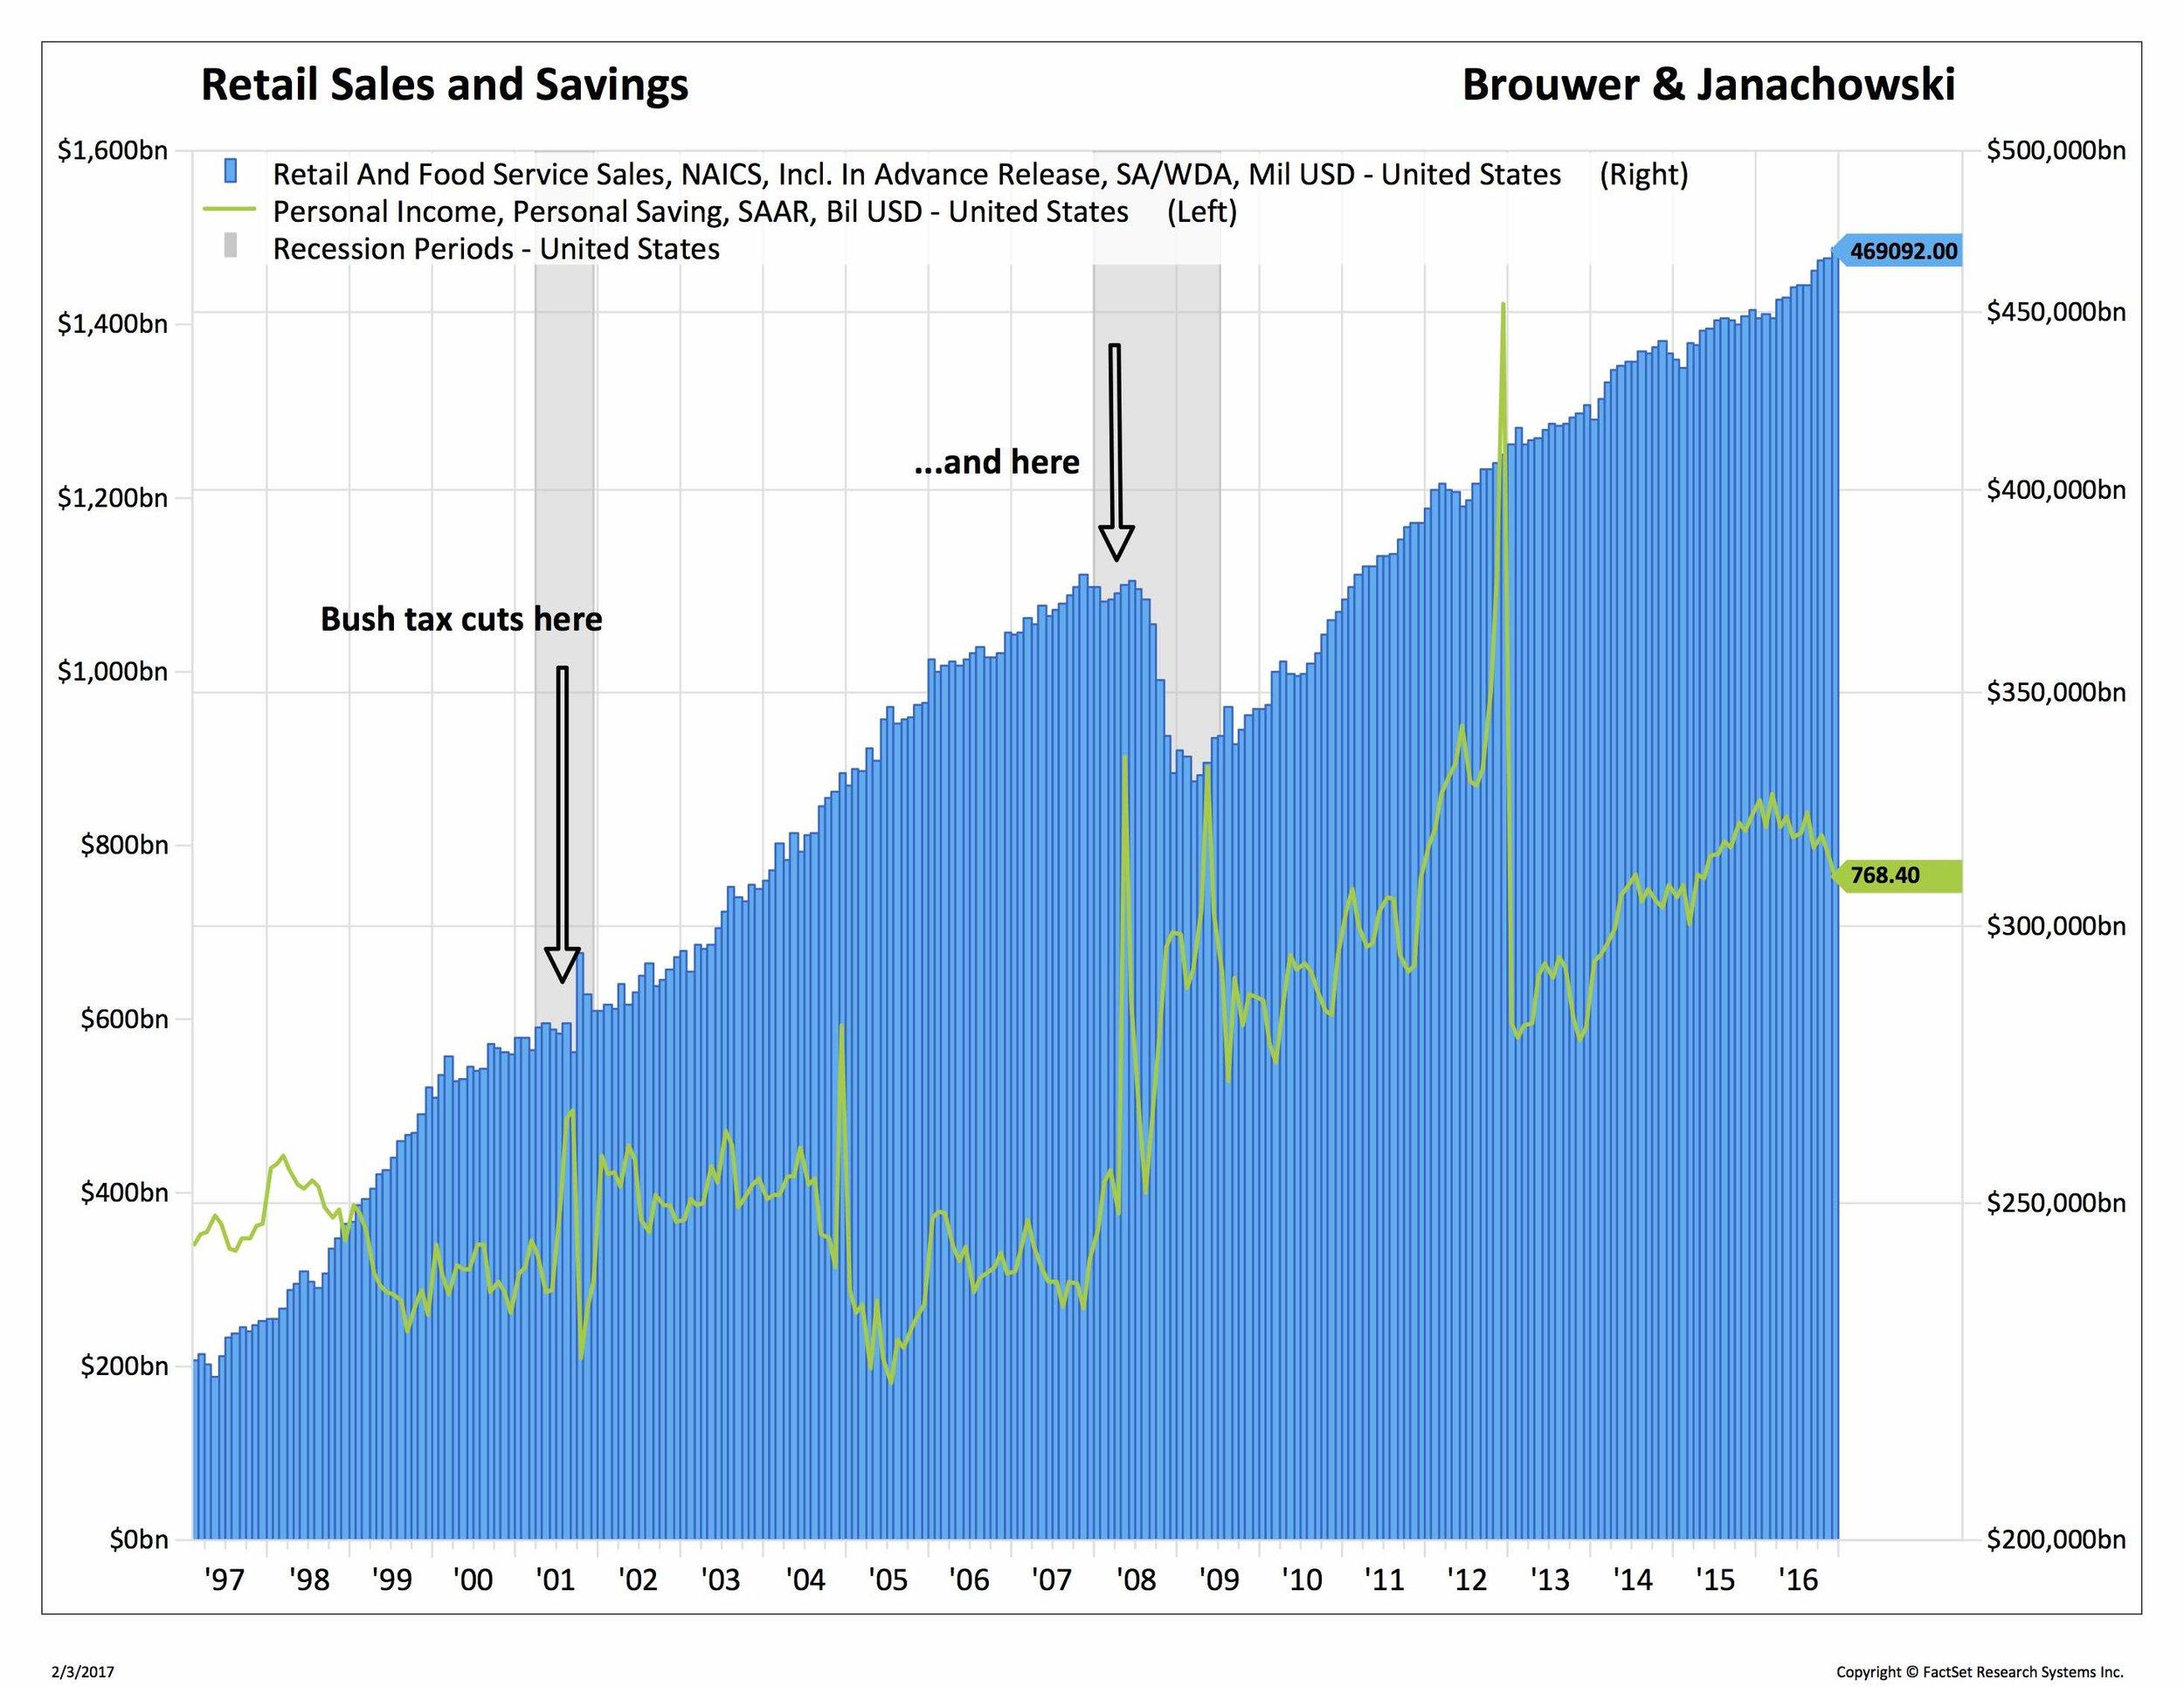 Retail sales and savings Brouwer and Janachowski